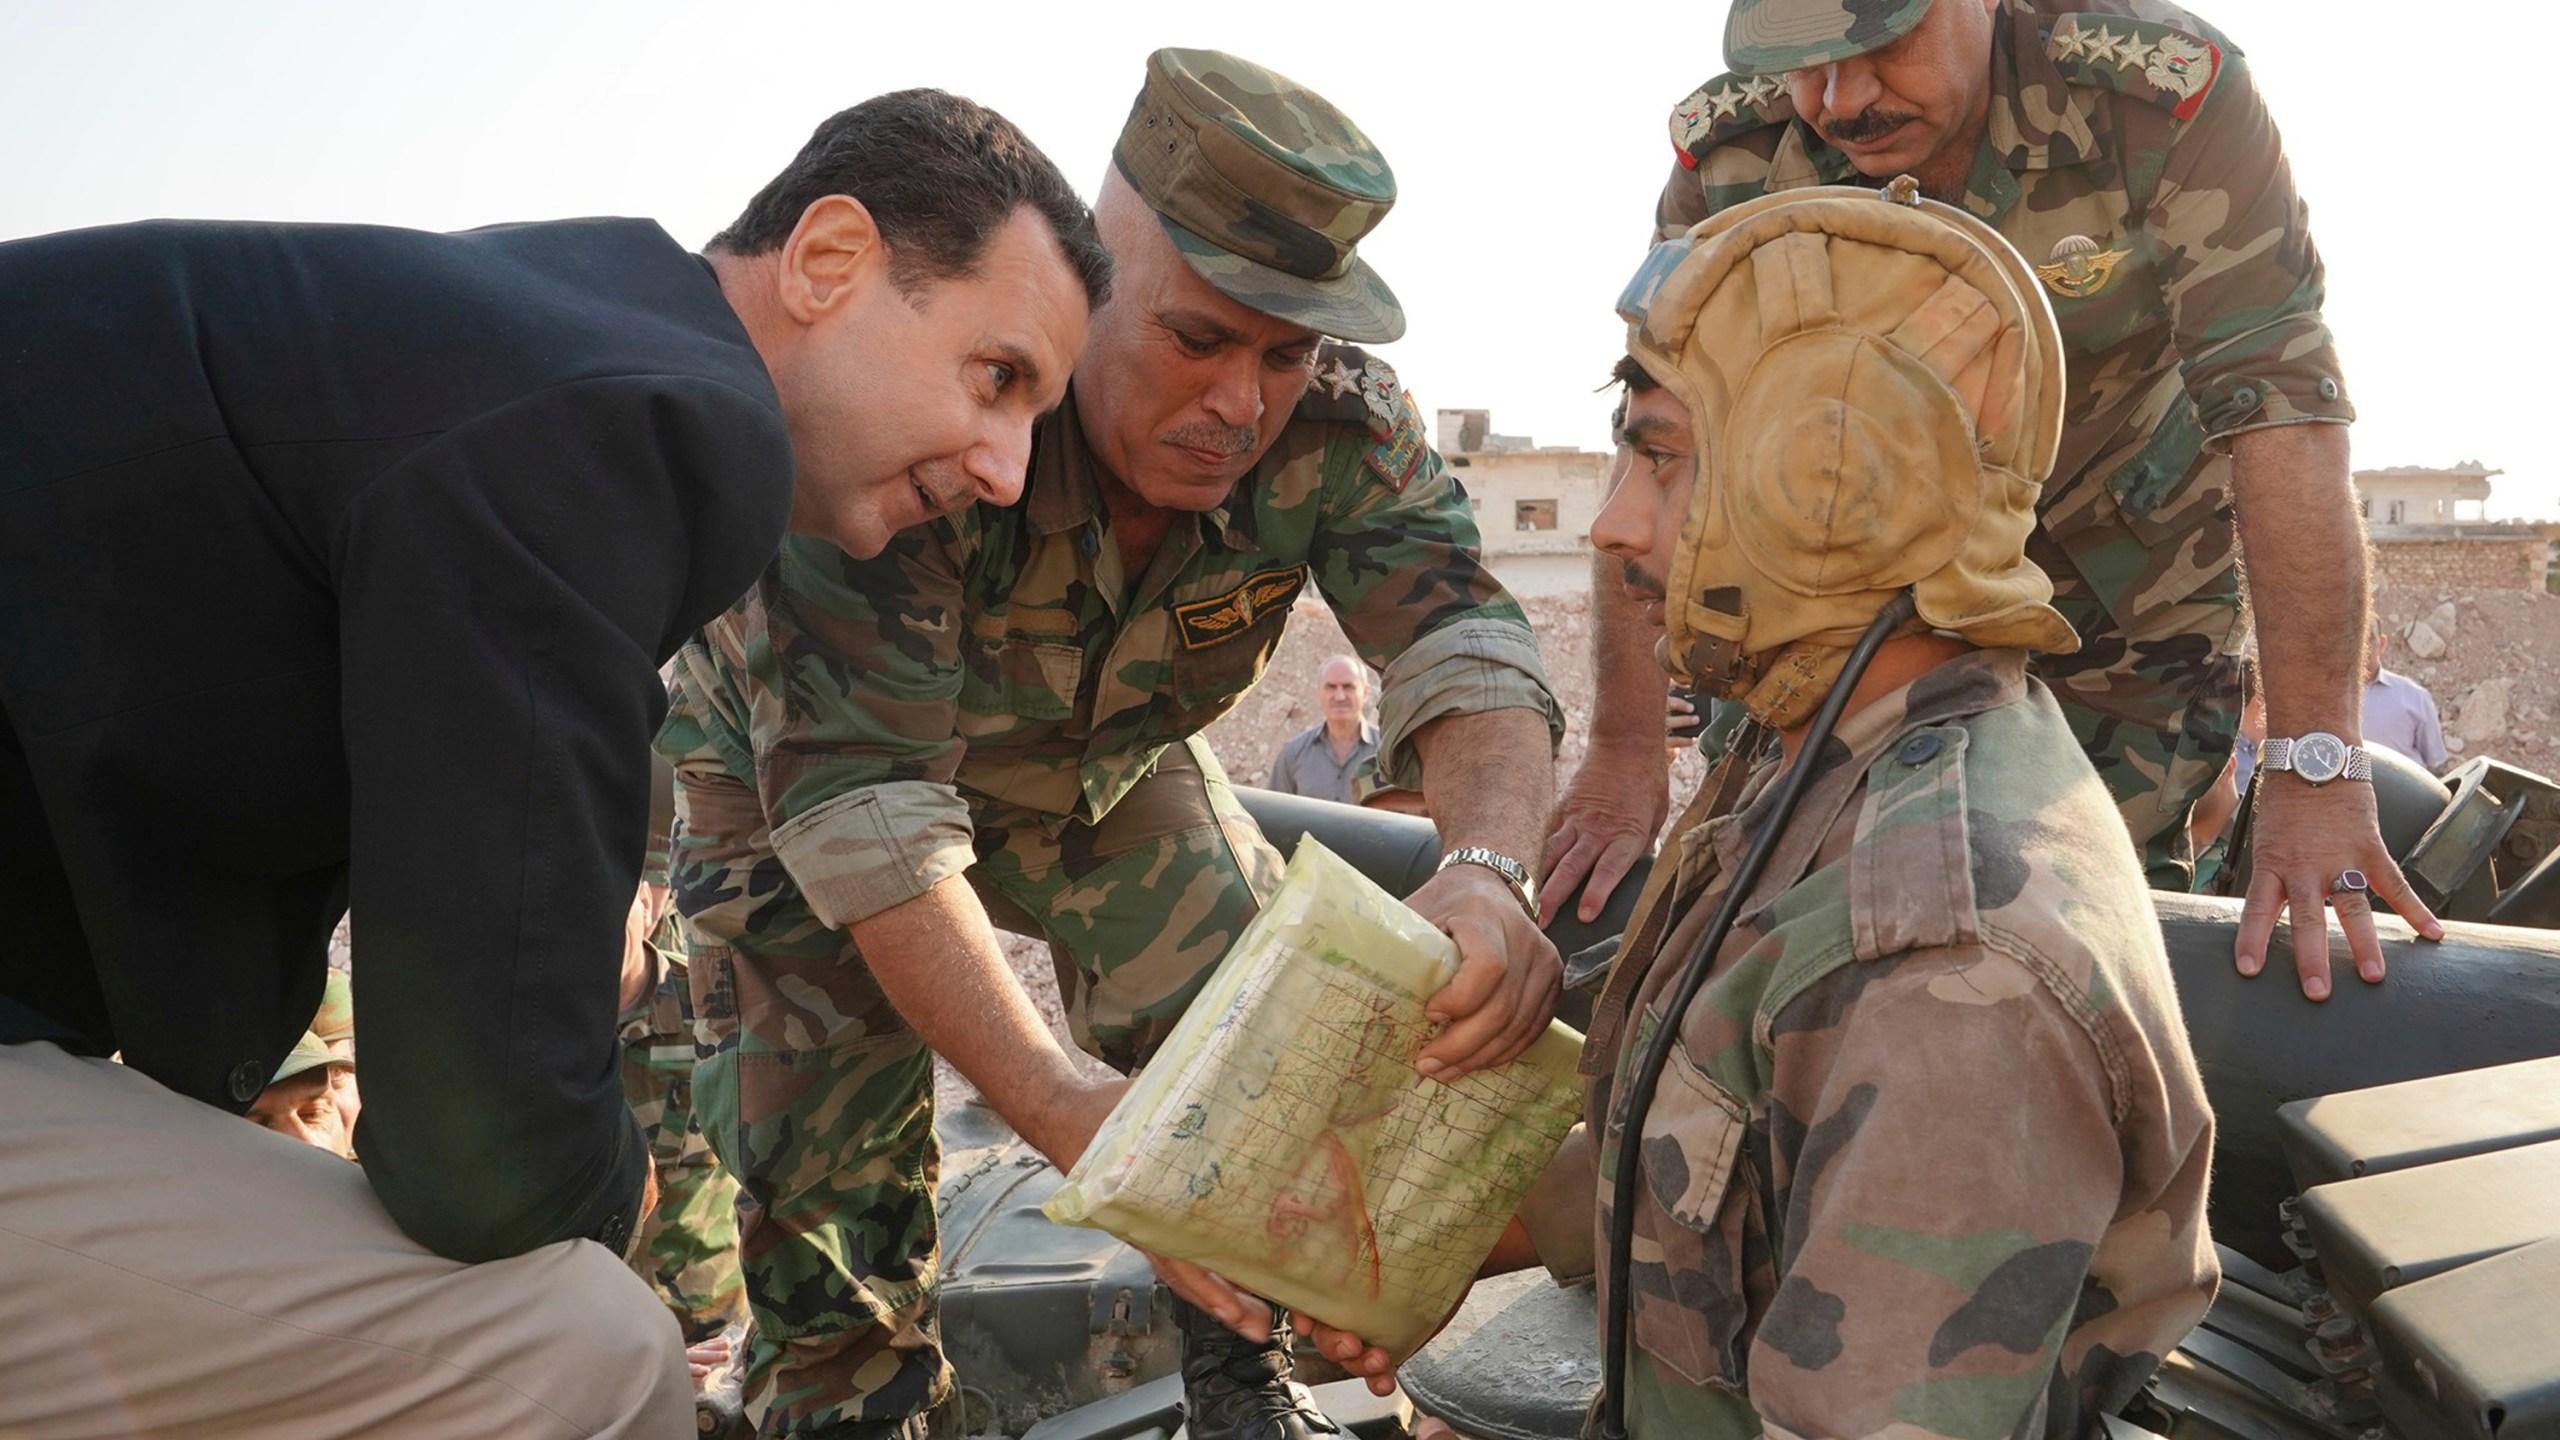 Bashar Assad